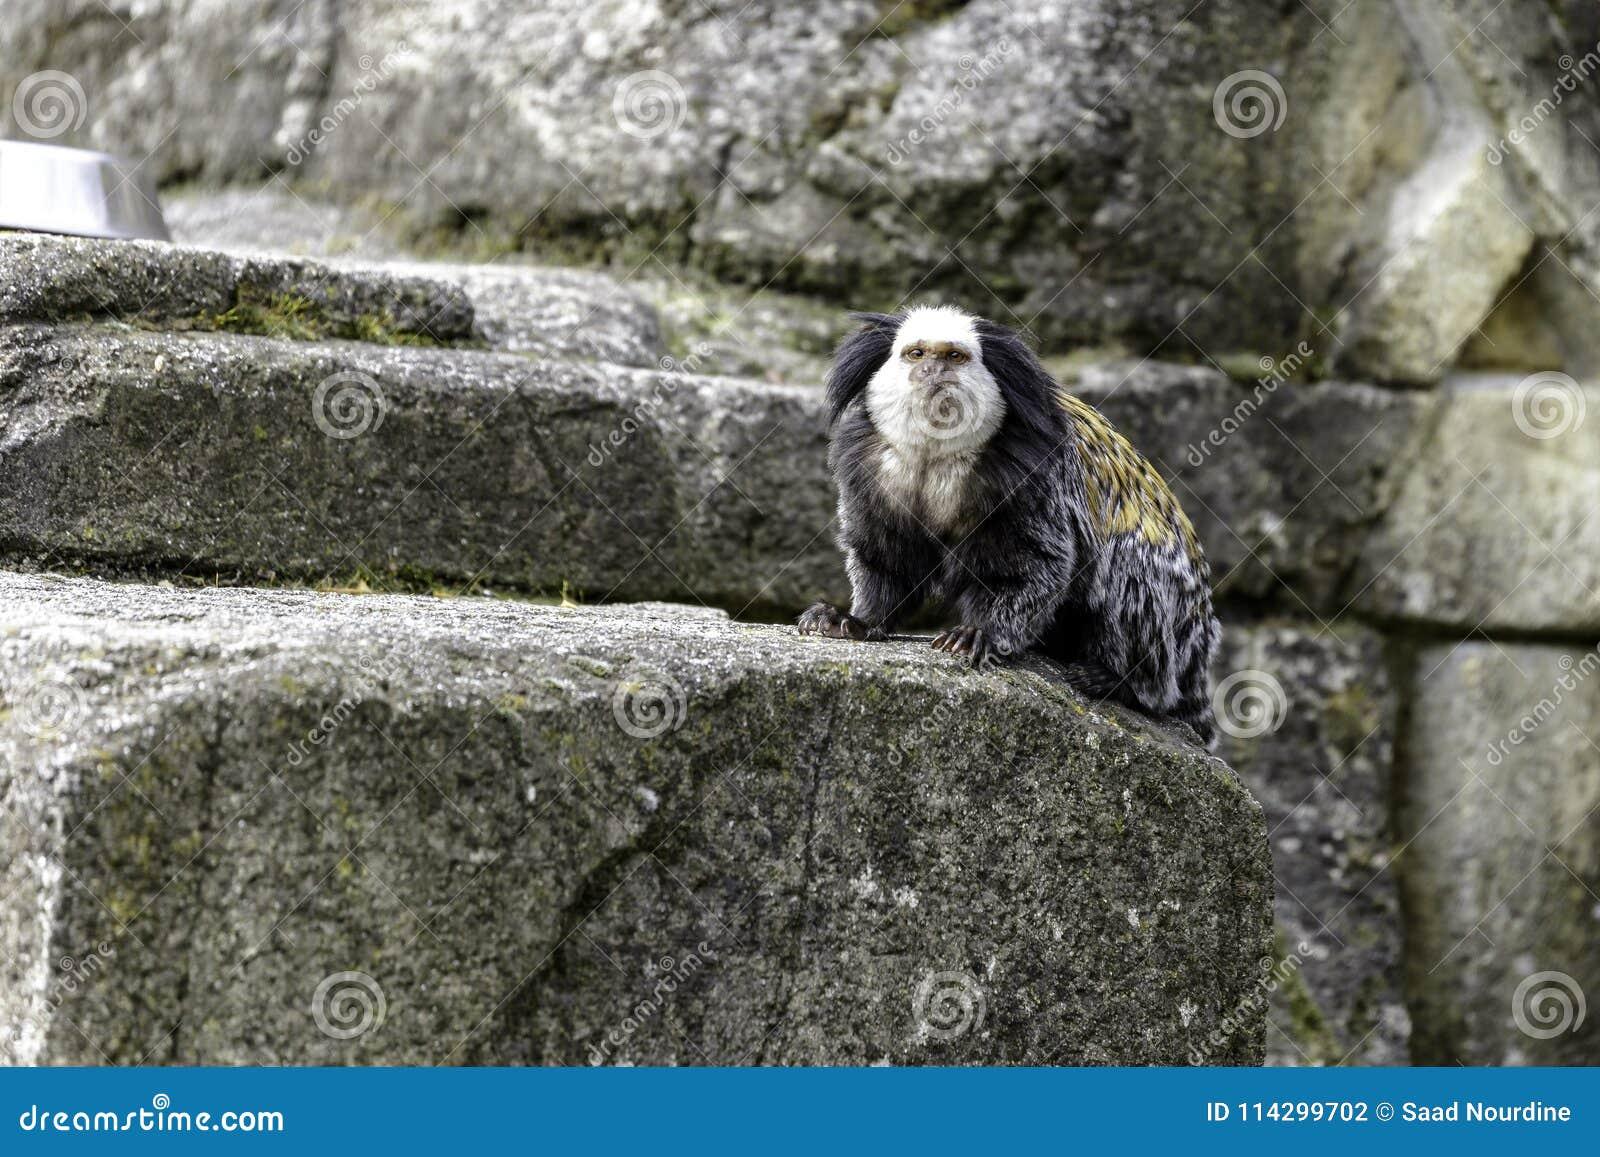 white-headed marmoset